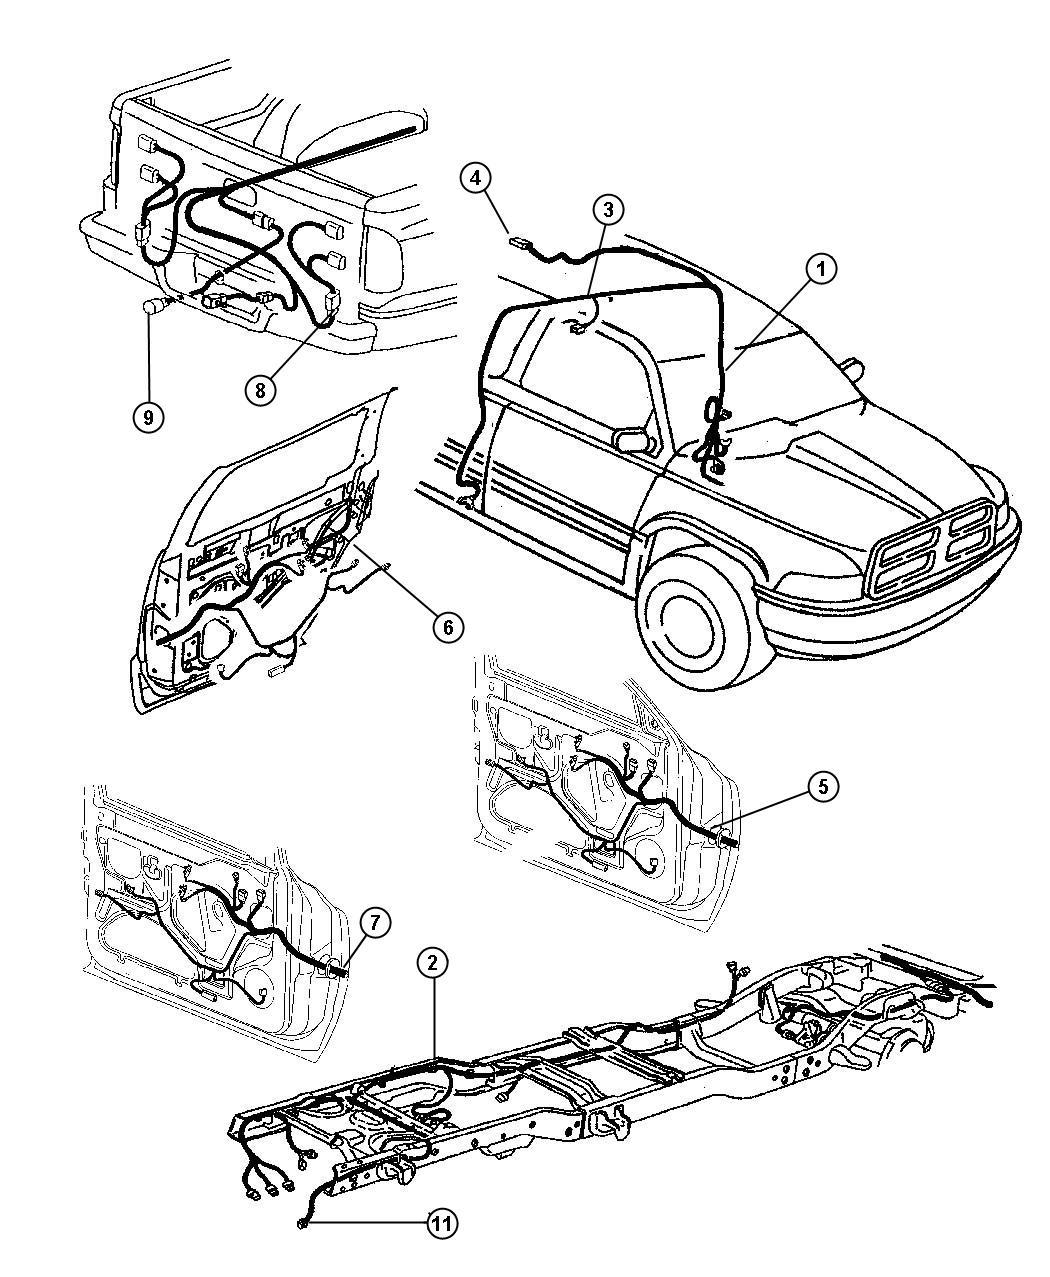 Dodge Ram 1500 Wiring. Air intake heater. Diesel engine